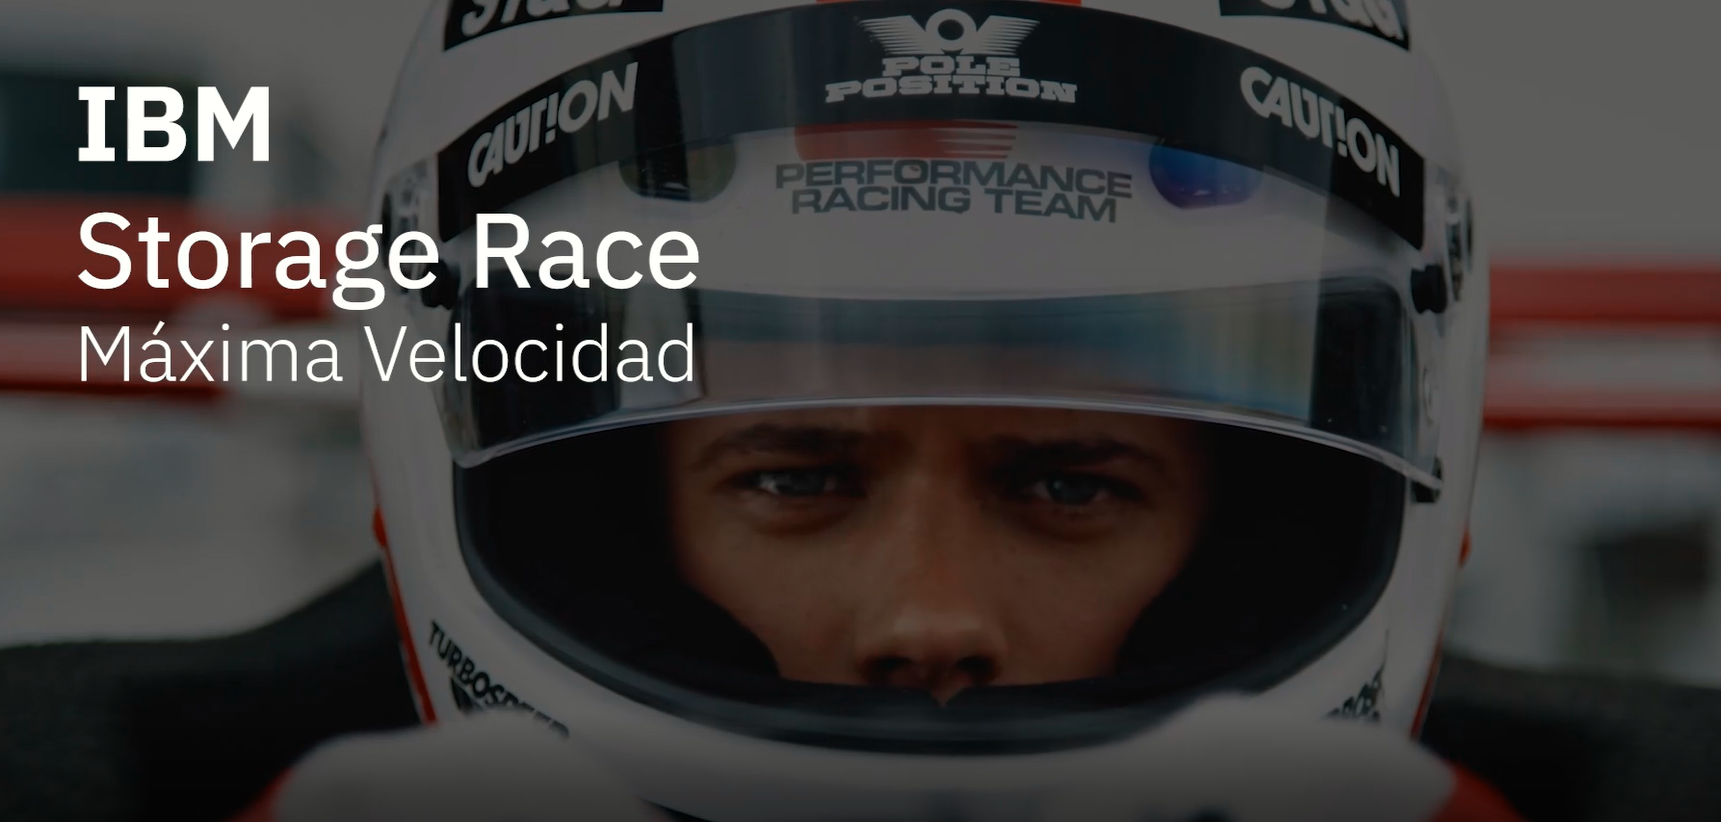 Grand Prix IBM Storage Race Máxima Velocidad